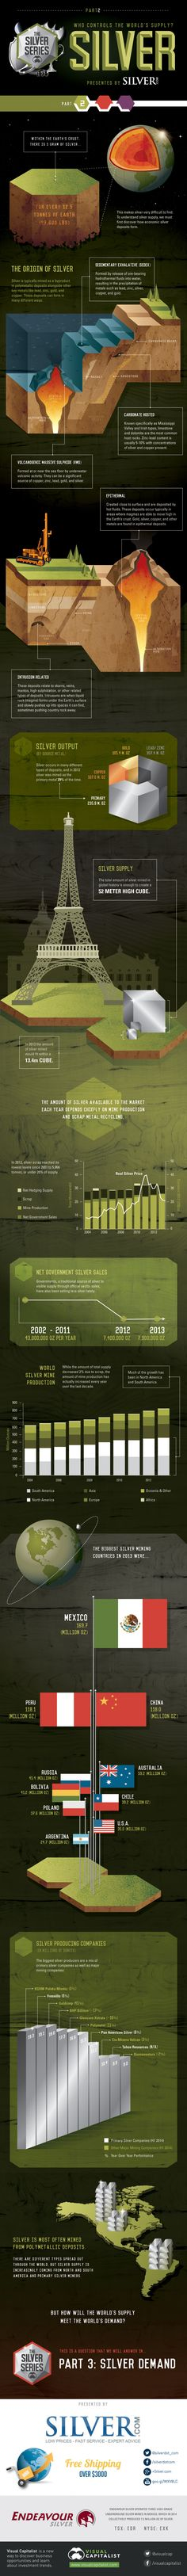 Visualizing Who Controls The World's Silver Supply? | Zero Hedge